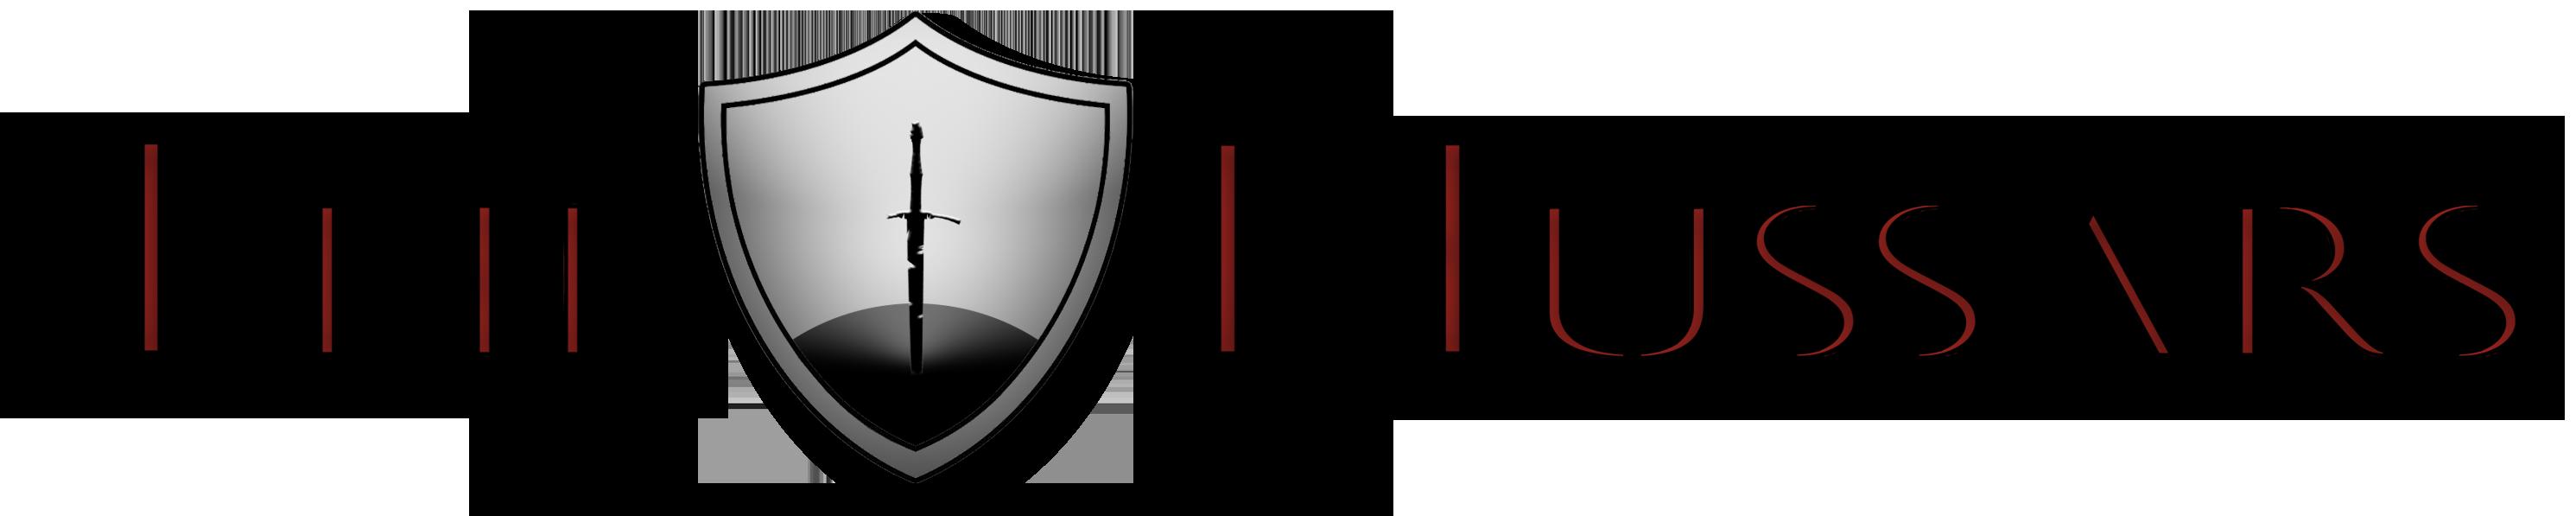 Bepis logo true combo